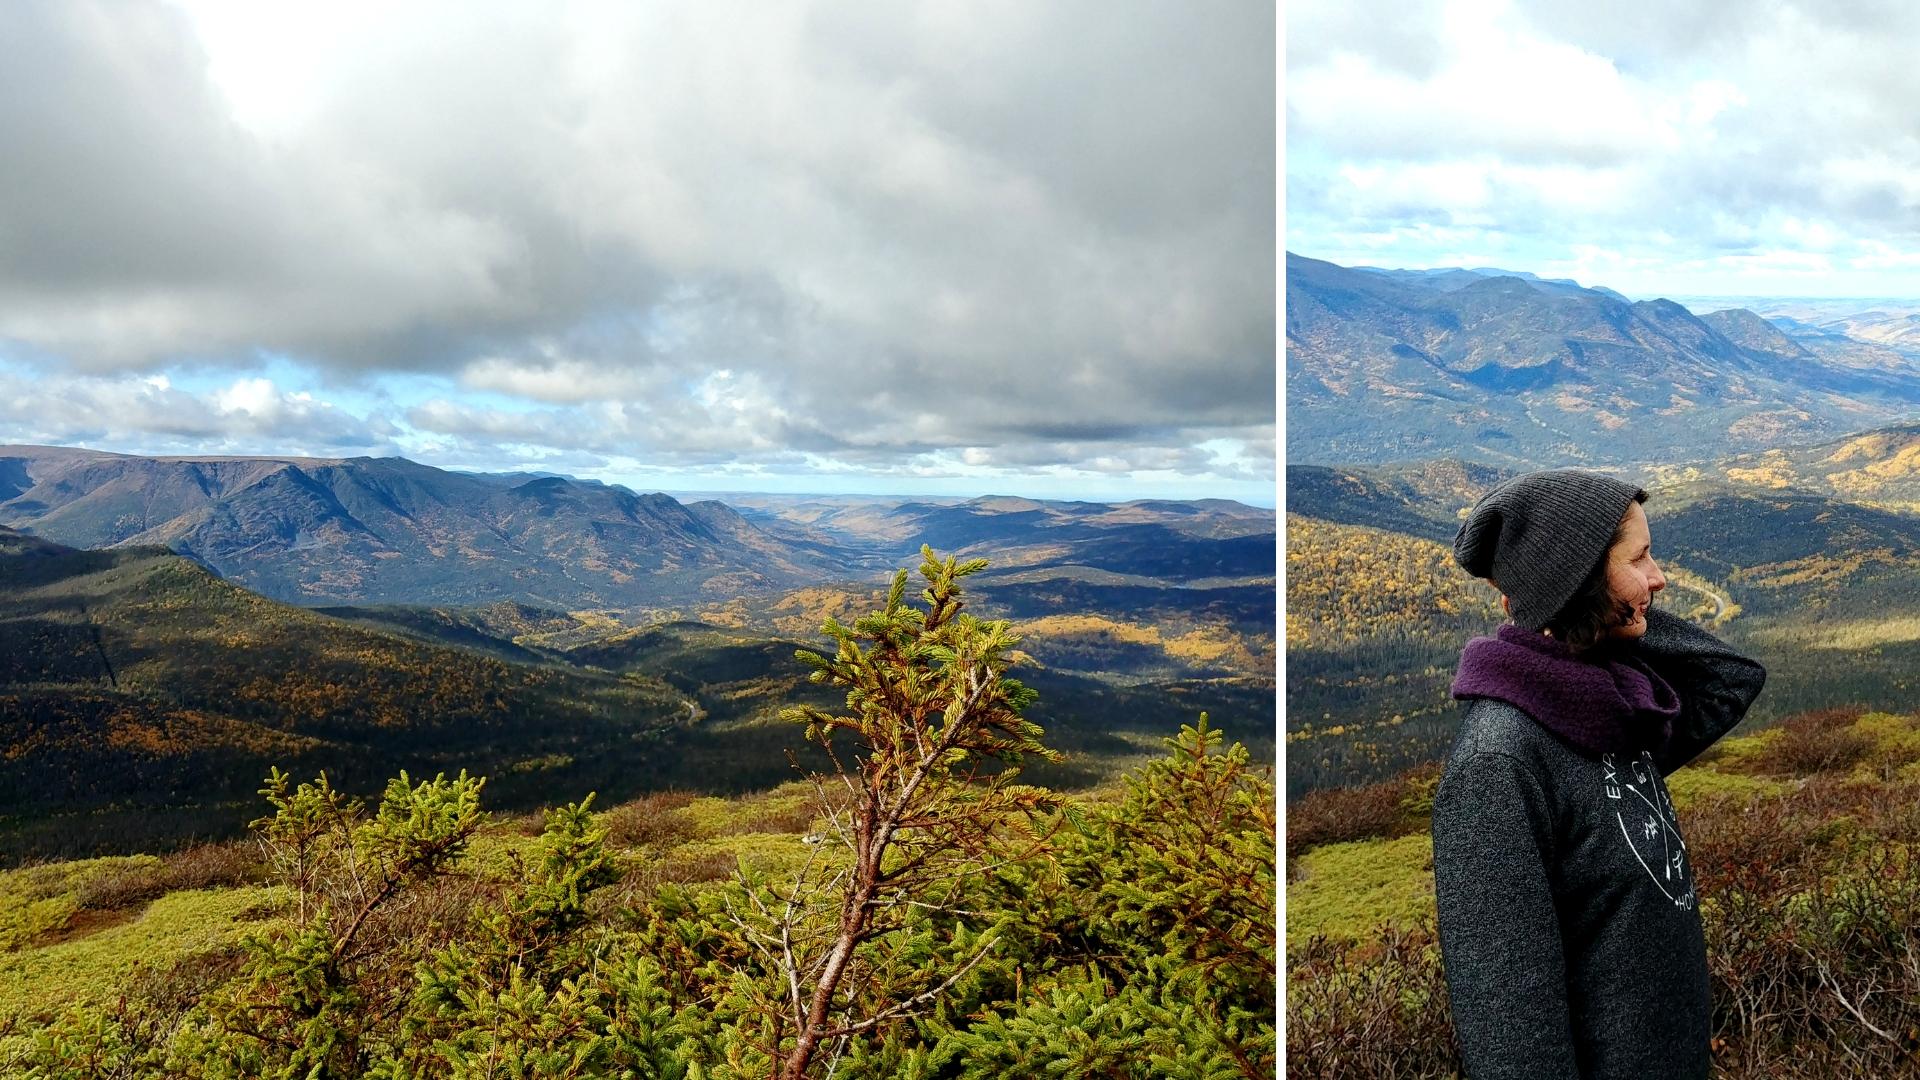 belvedere falaise randonnee gaspesie automne blog voyage canada road-trip arpenter le chemin